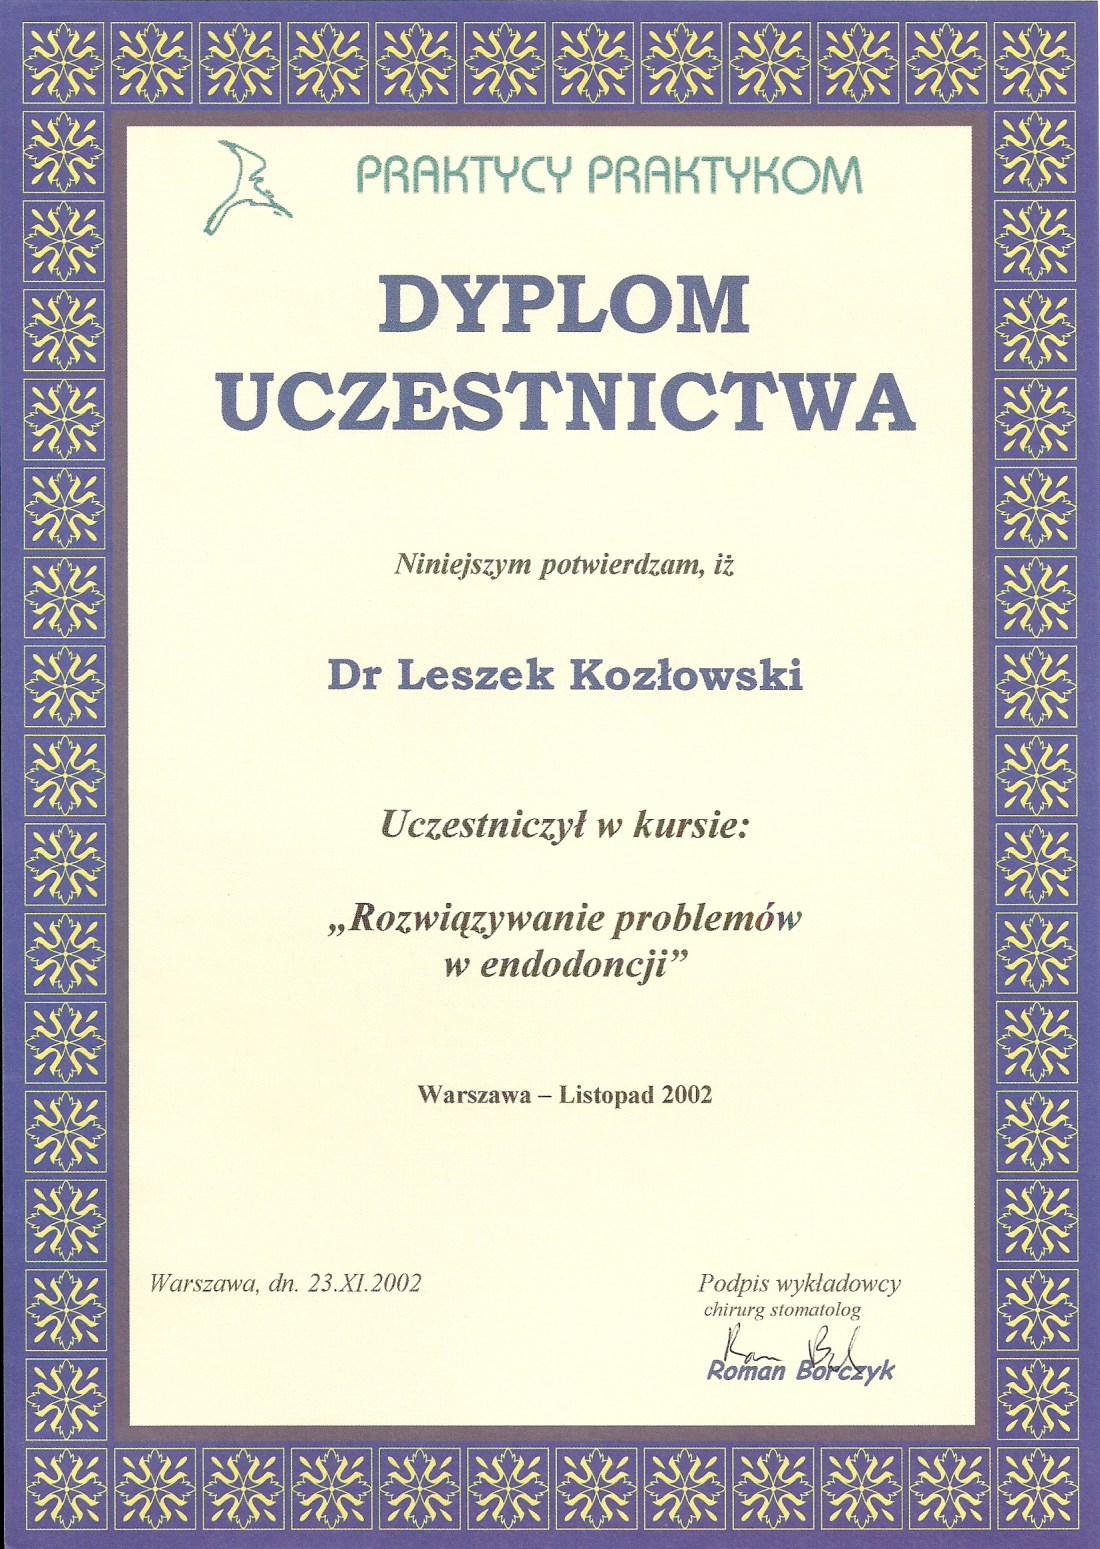 dentysta warszawa DENTYSTA WARSZAWA – DENTOKLINIKA Dentysta warszawa Leszek Kozlowski Certyfikat 10